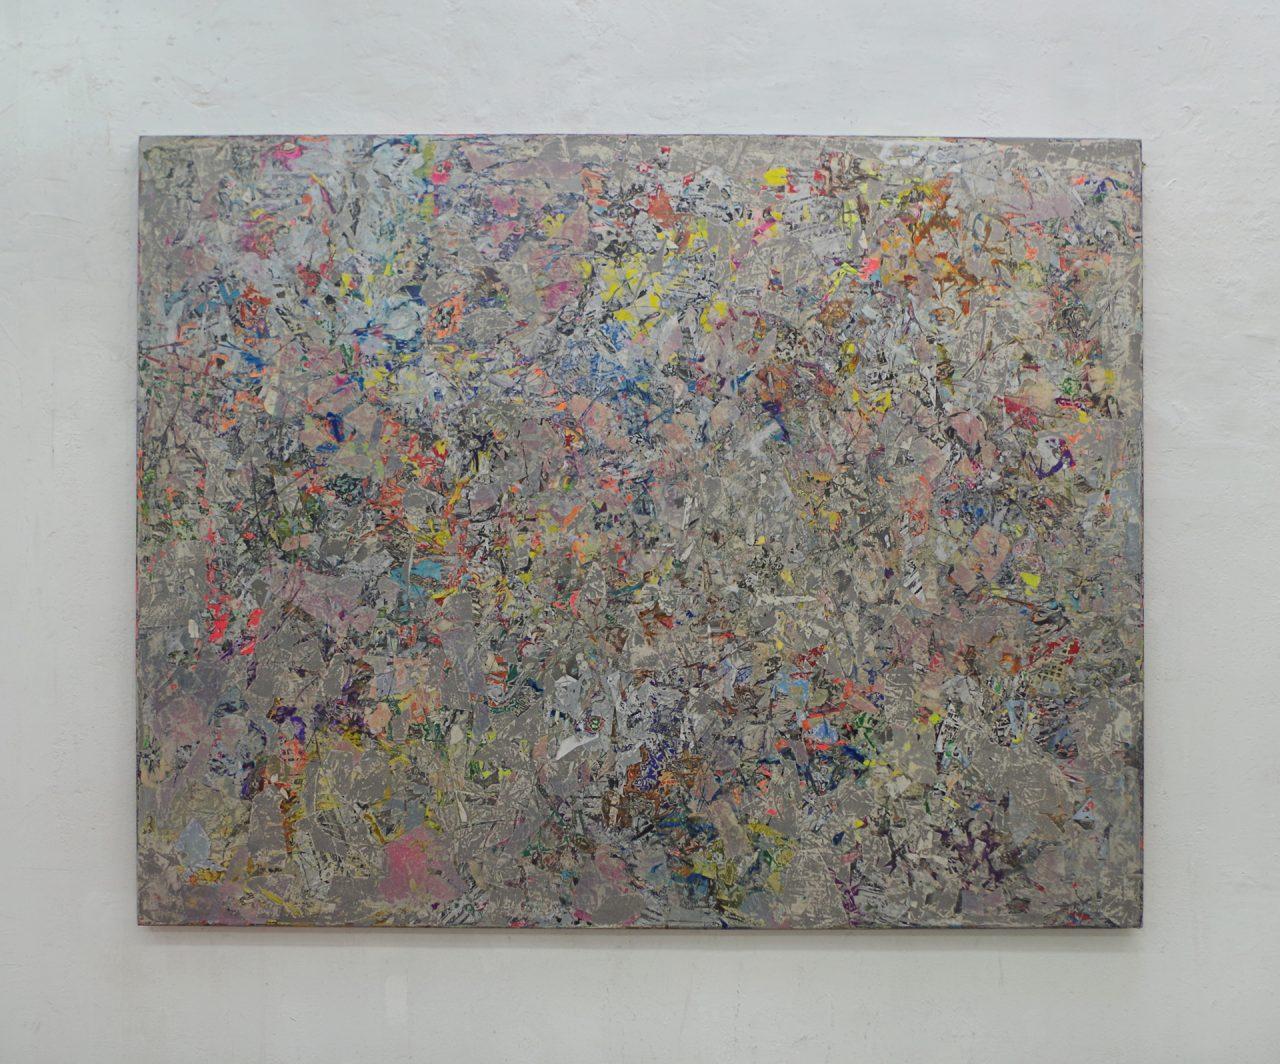 2018, Acryl, Spraypaint, Papier, Leinwand, Keilrahmen 180cm x 220cm